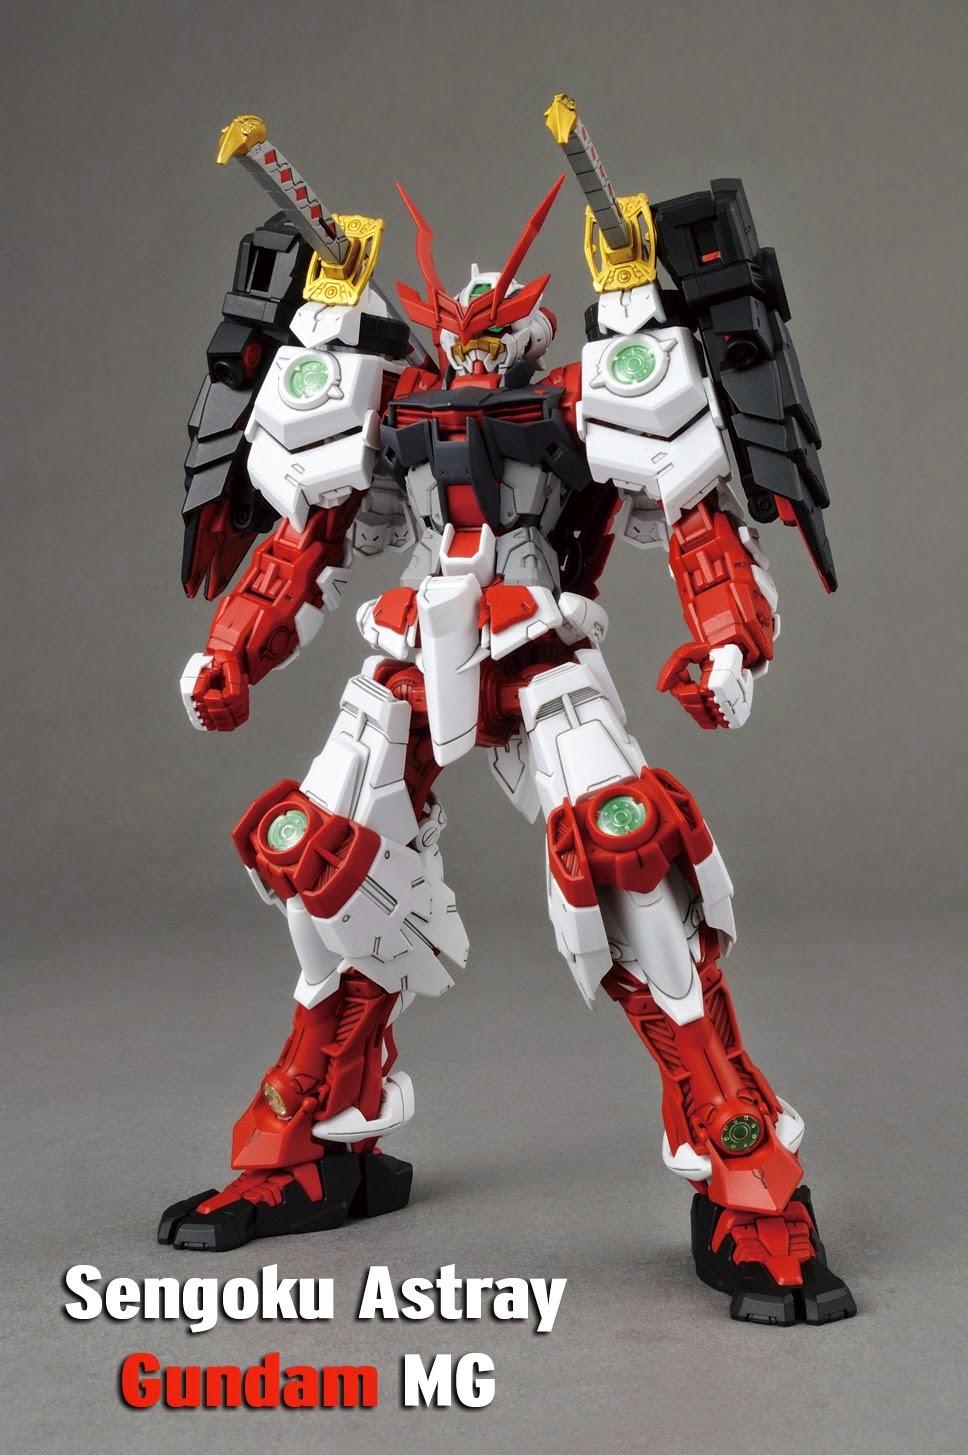 Sengoku Astray Gundam Master Grade gunpla recensione